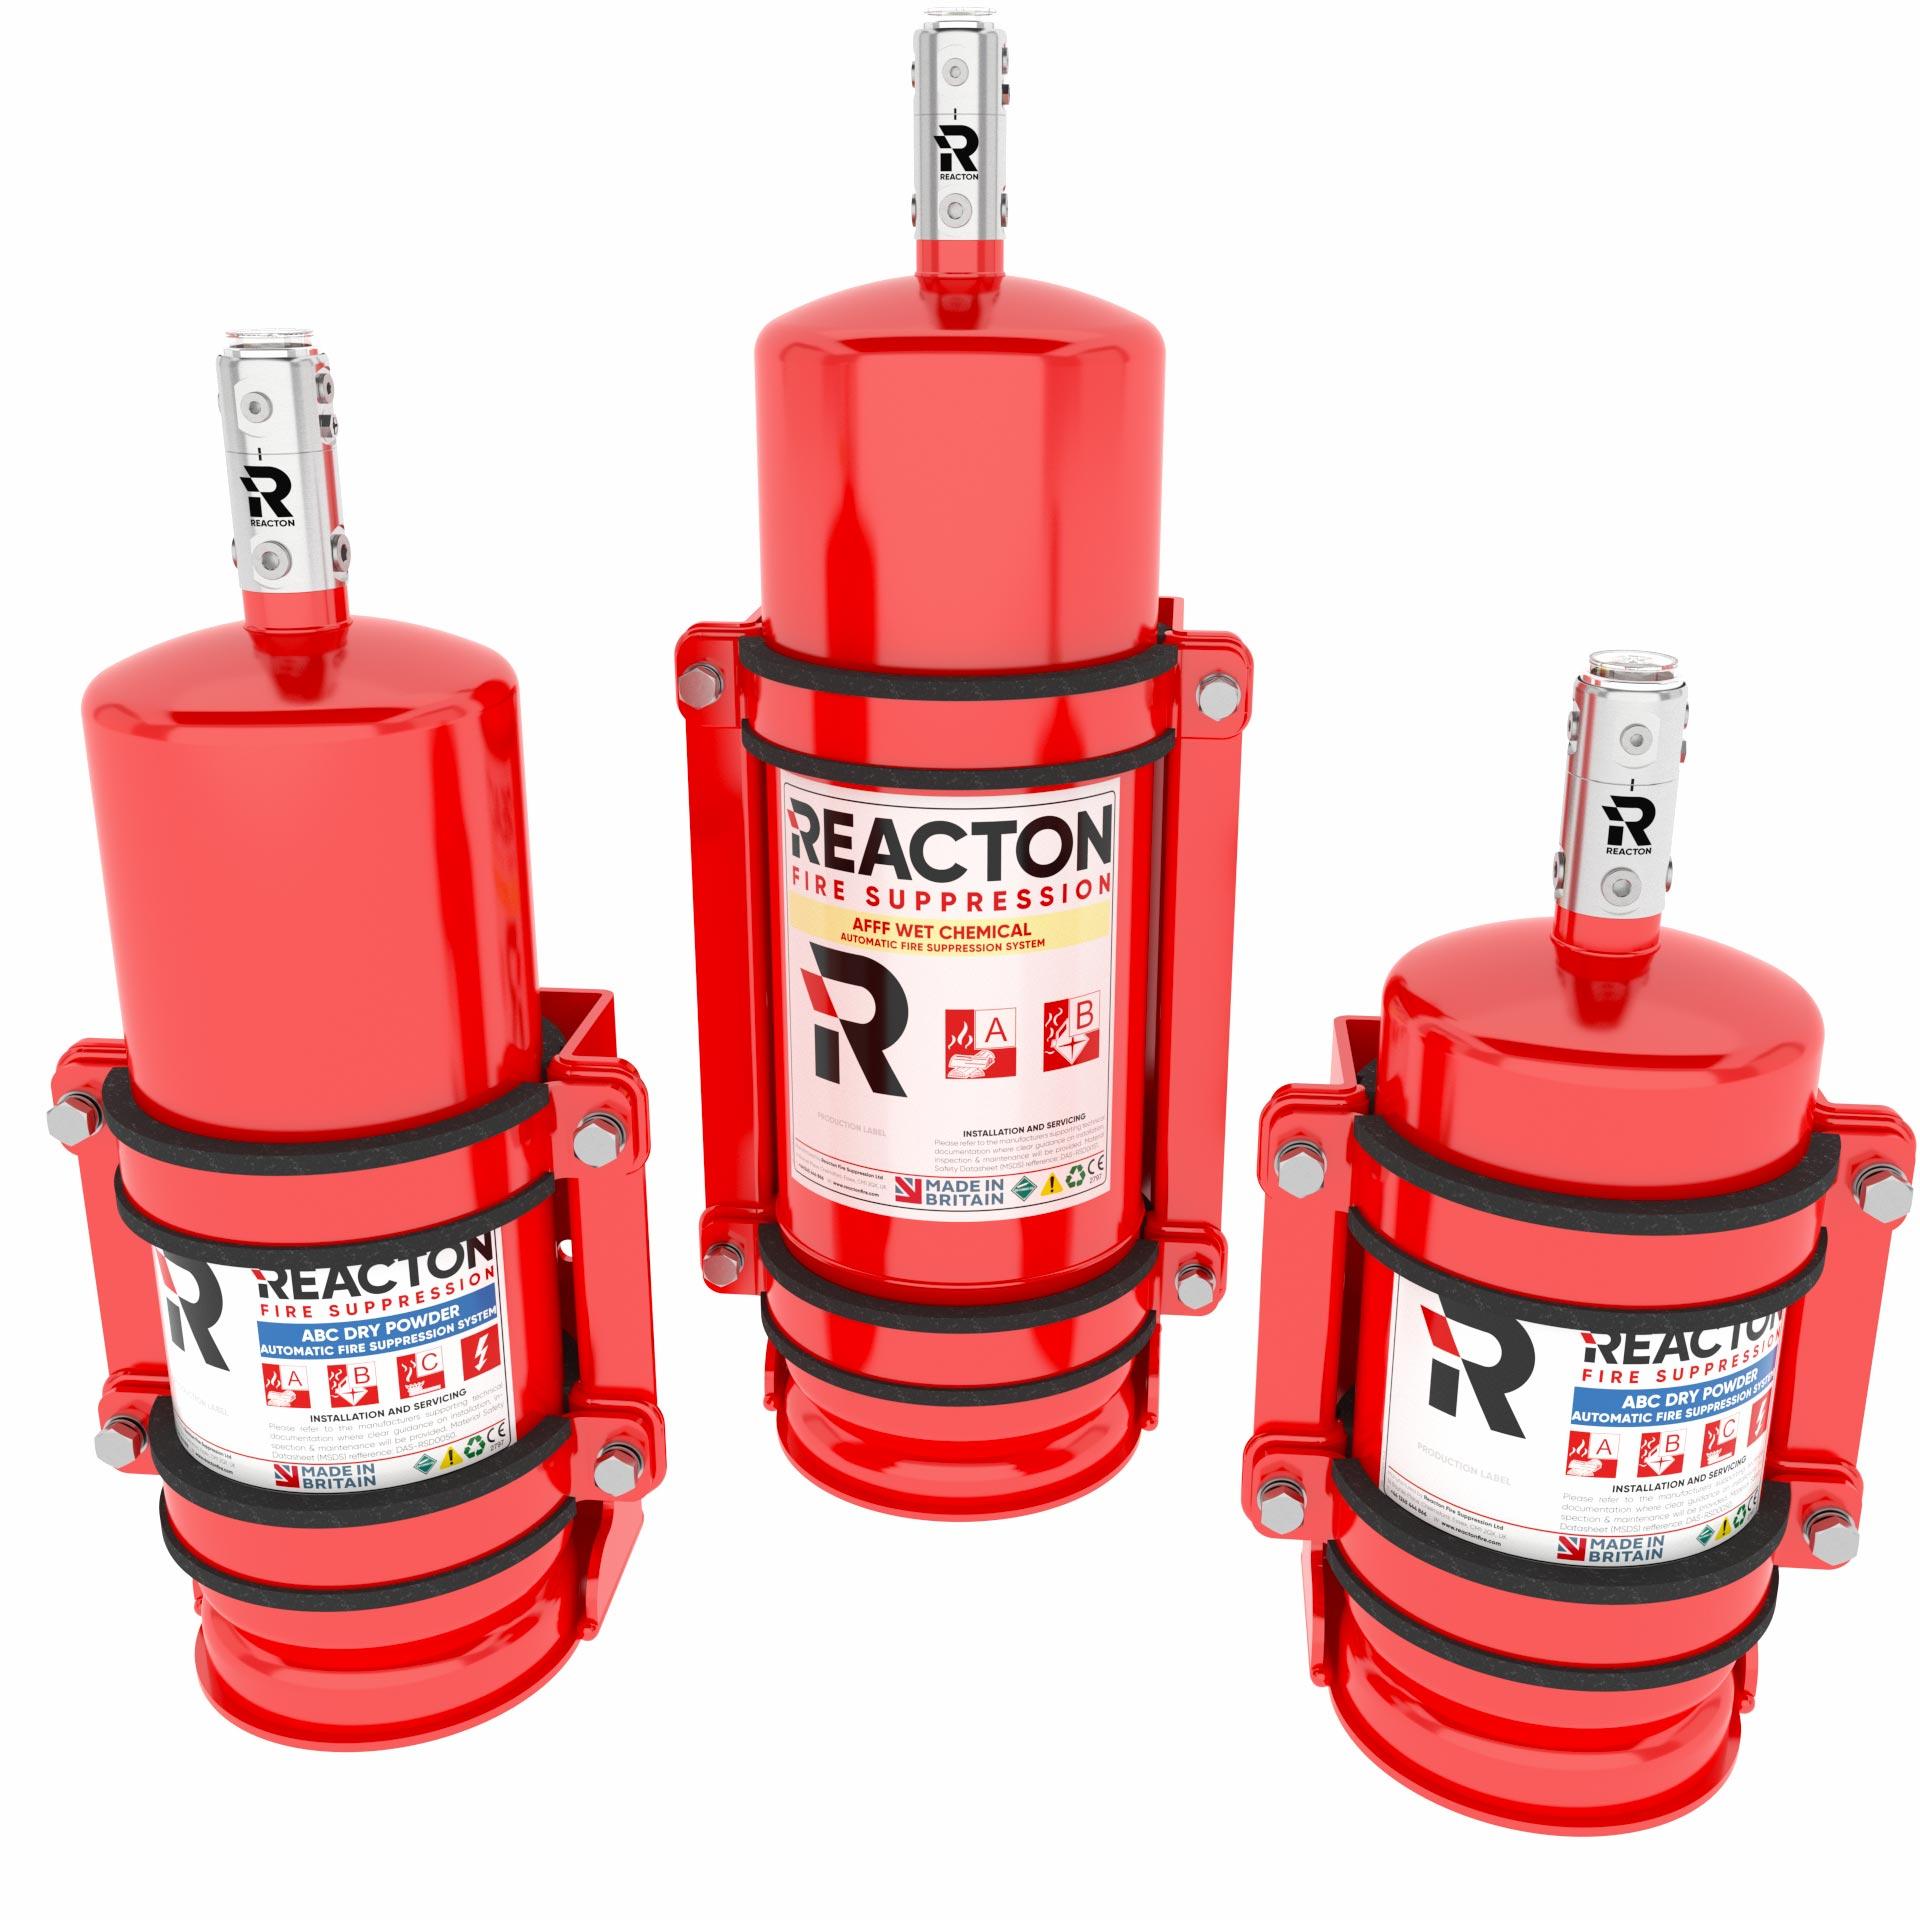 Reacton-4-6-9-kg-Fire-Suppression-01